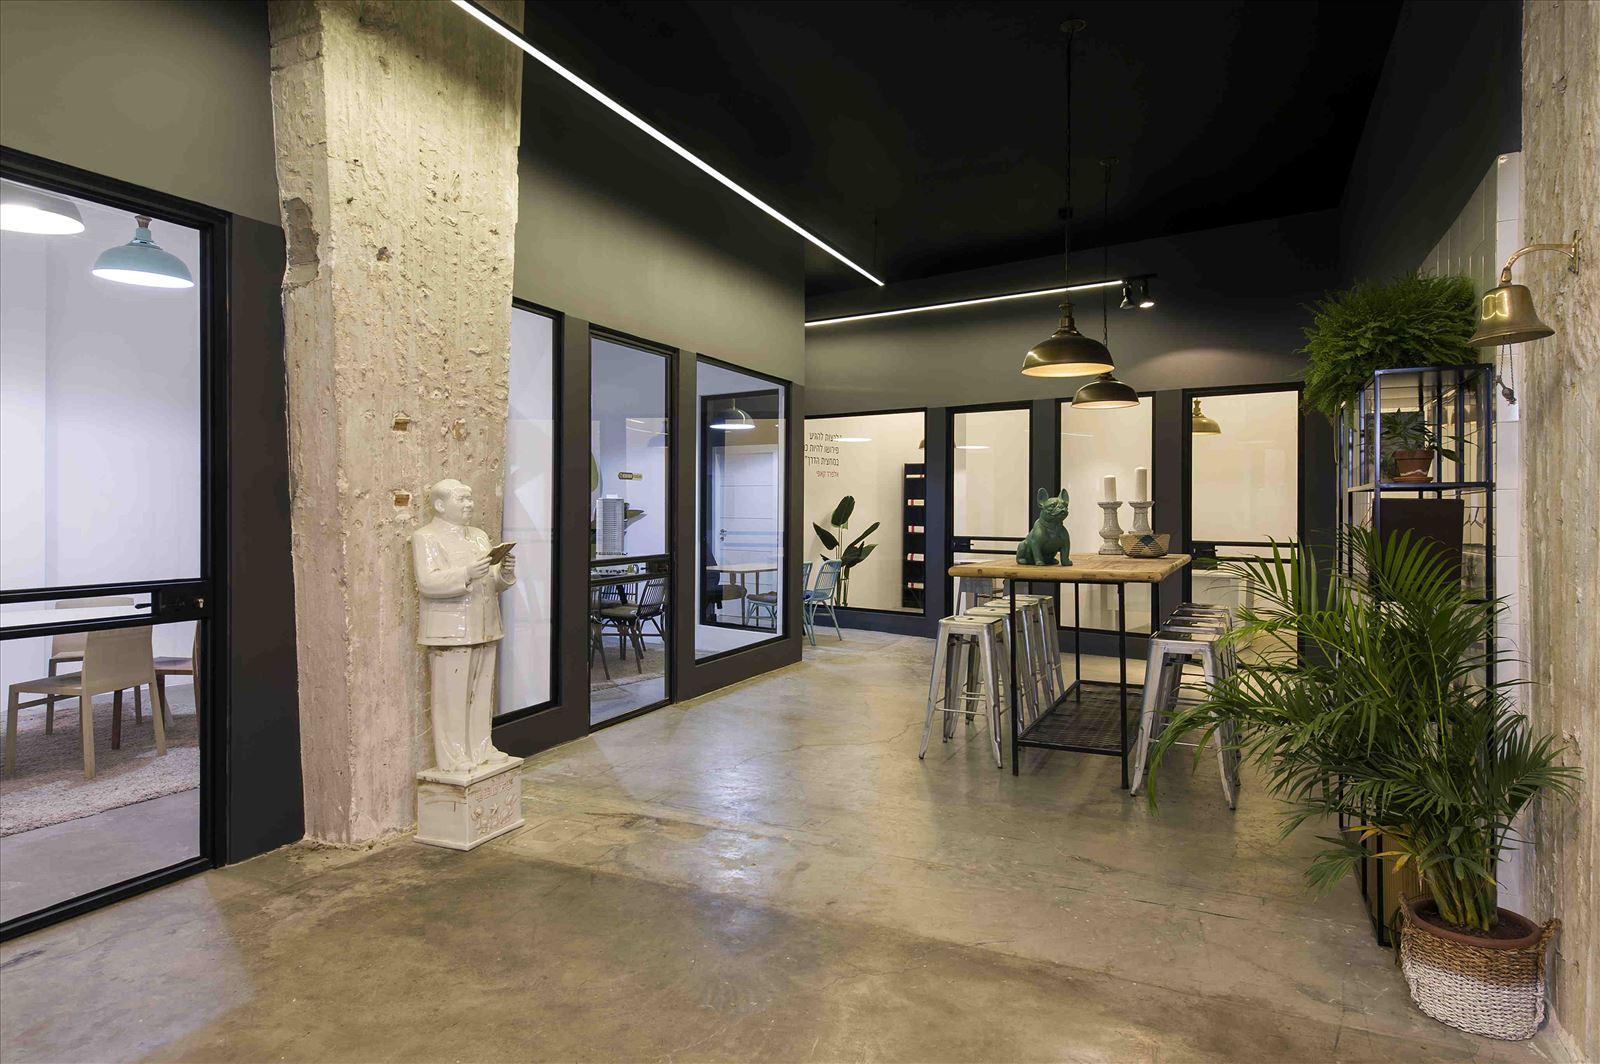 Ewave Offices תאורה בחלל המשרדים על ידי דורי קמחי תאורה אדריכלית